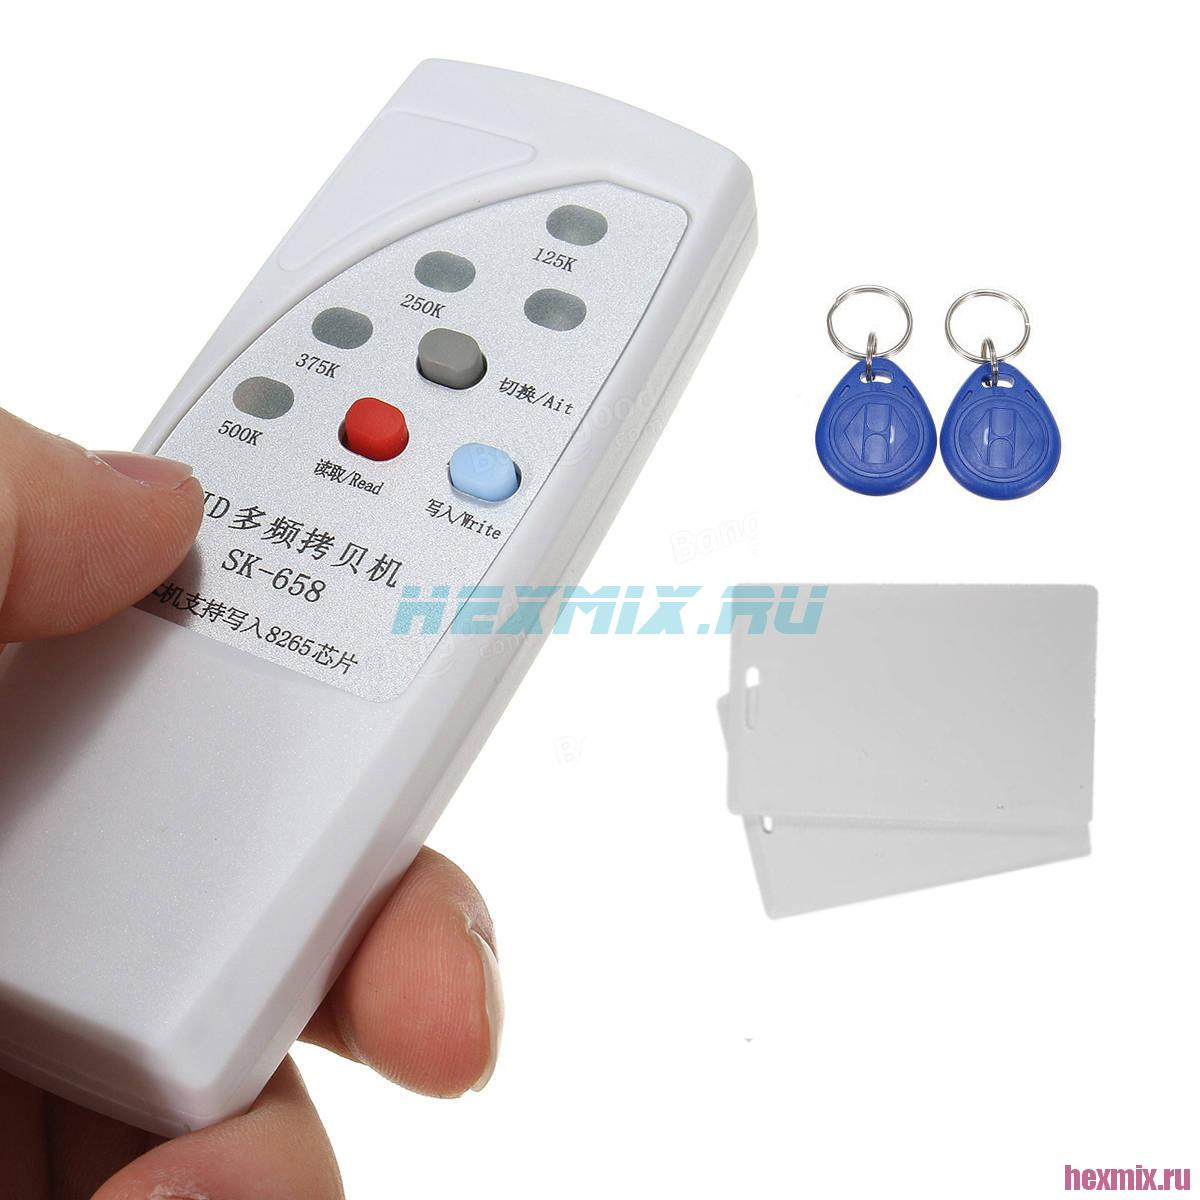 Sk-658 Universal Duplicator RFID Tags